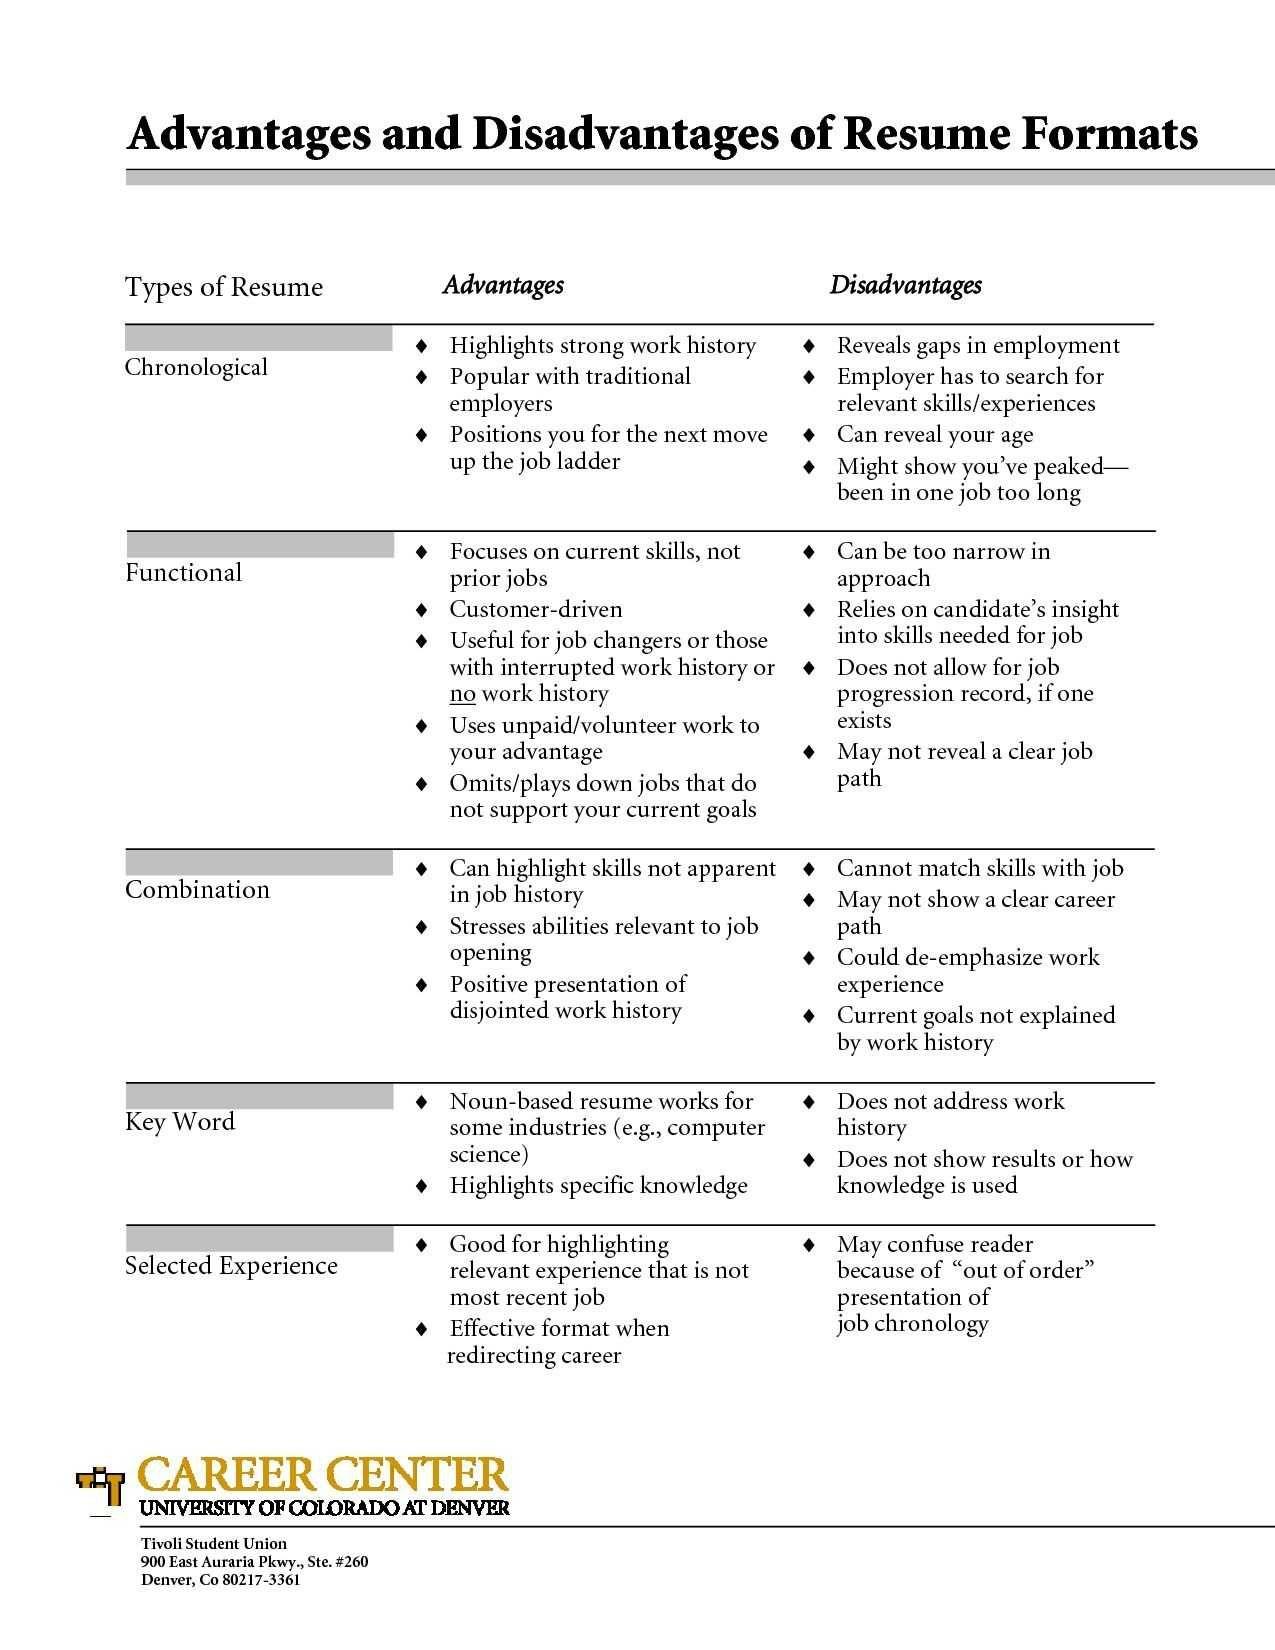 Top Resume Format Resume format, Types of resumes